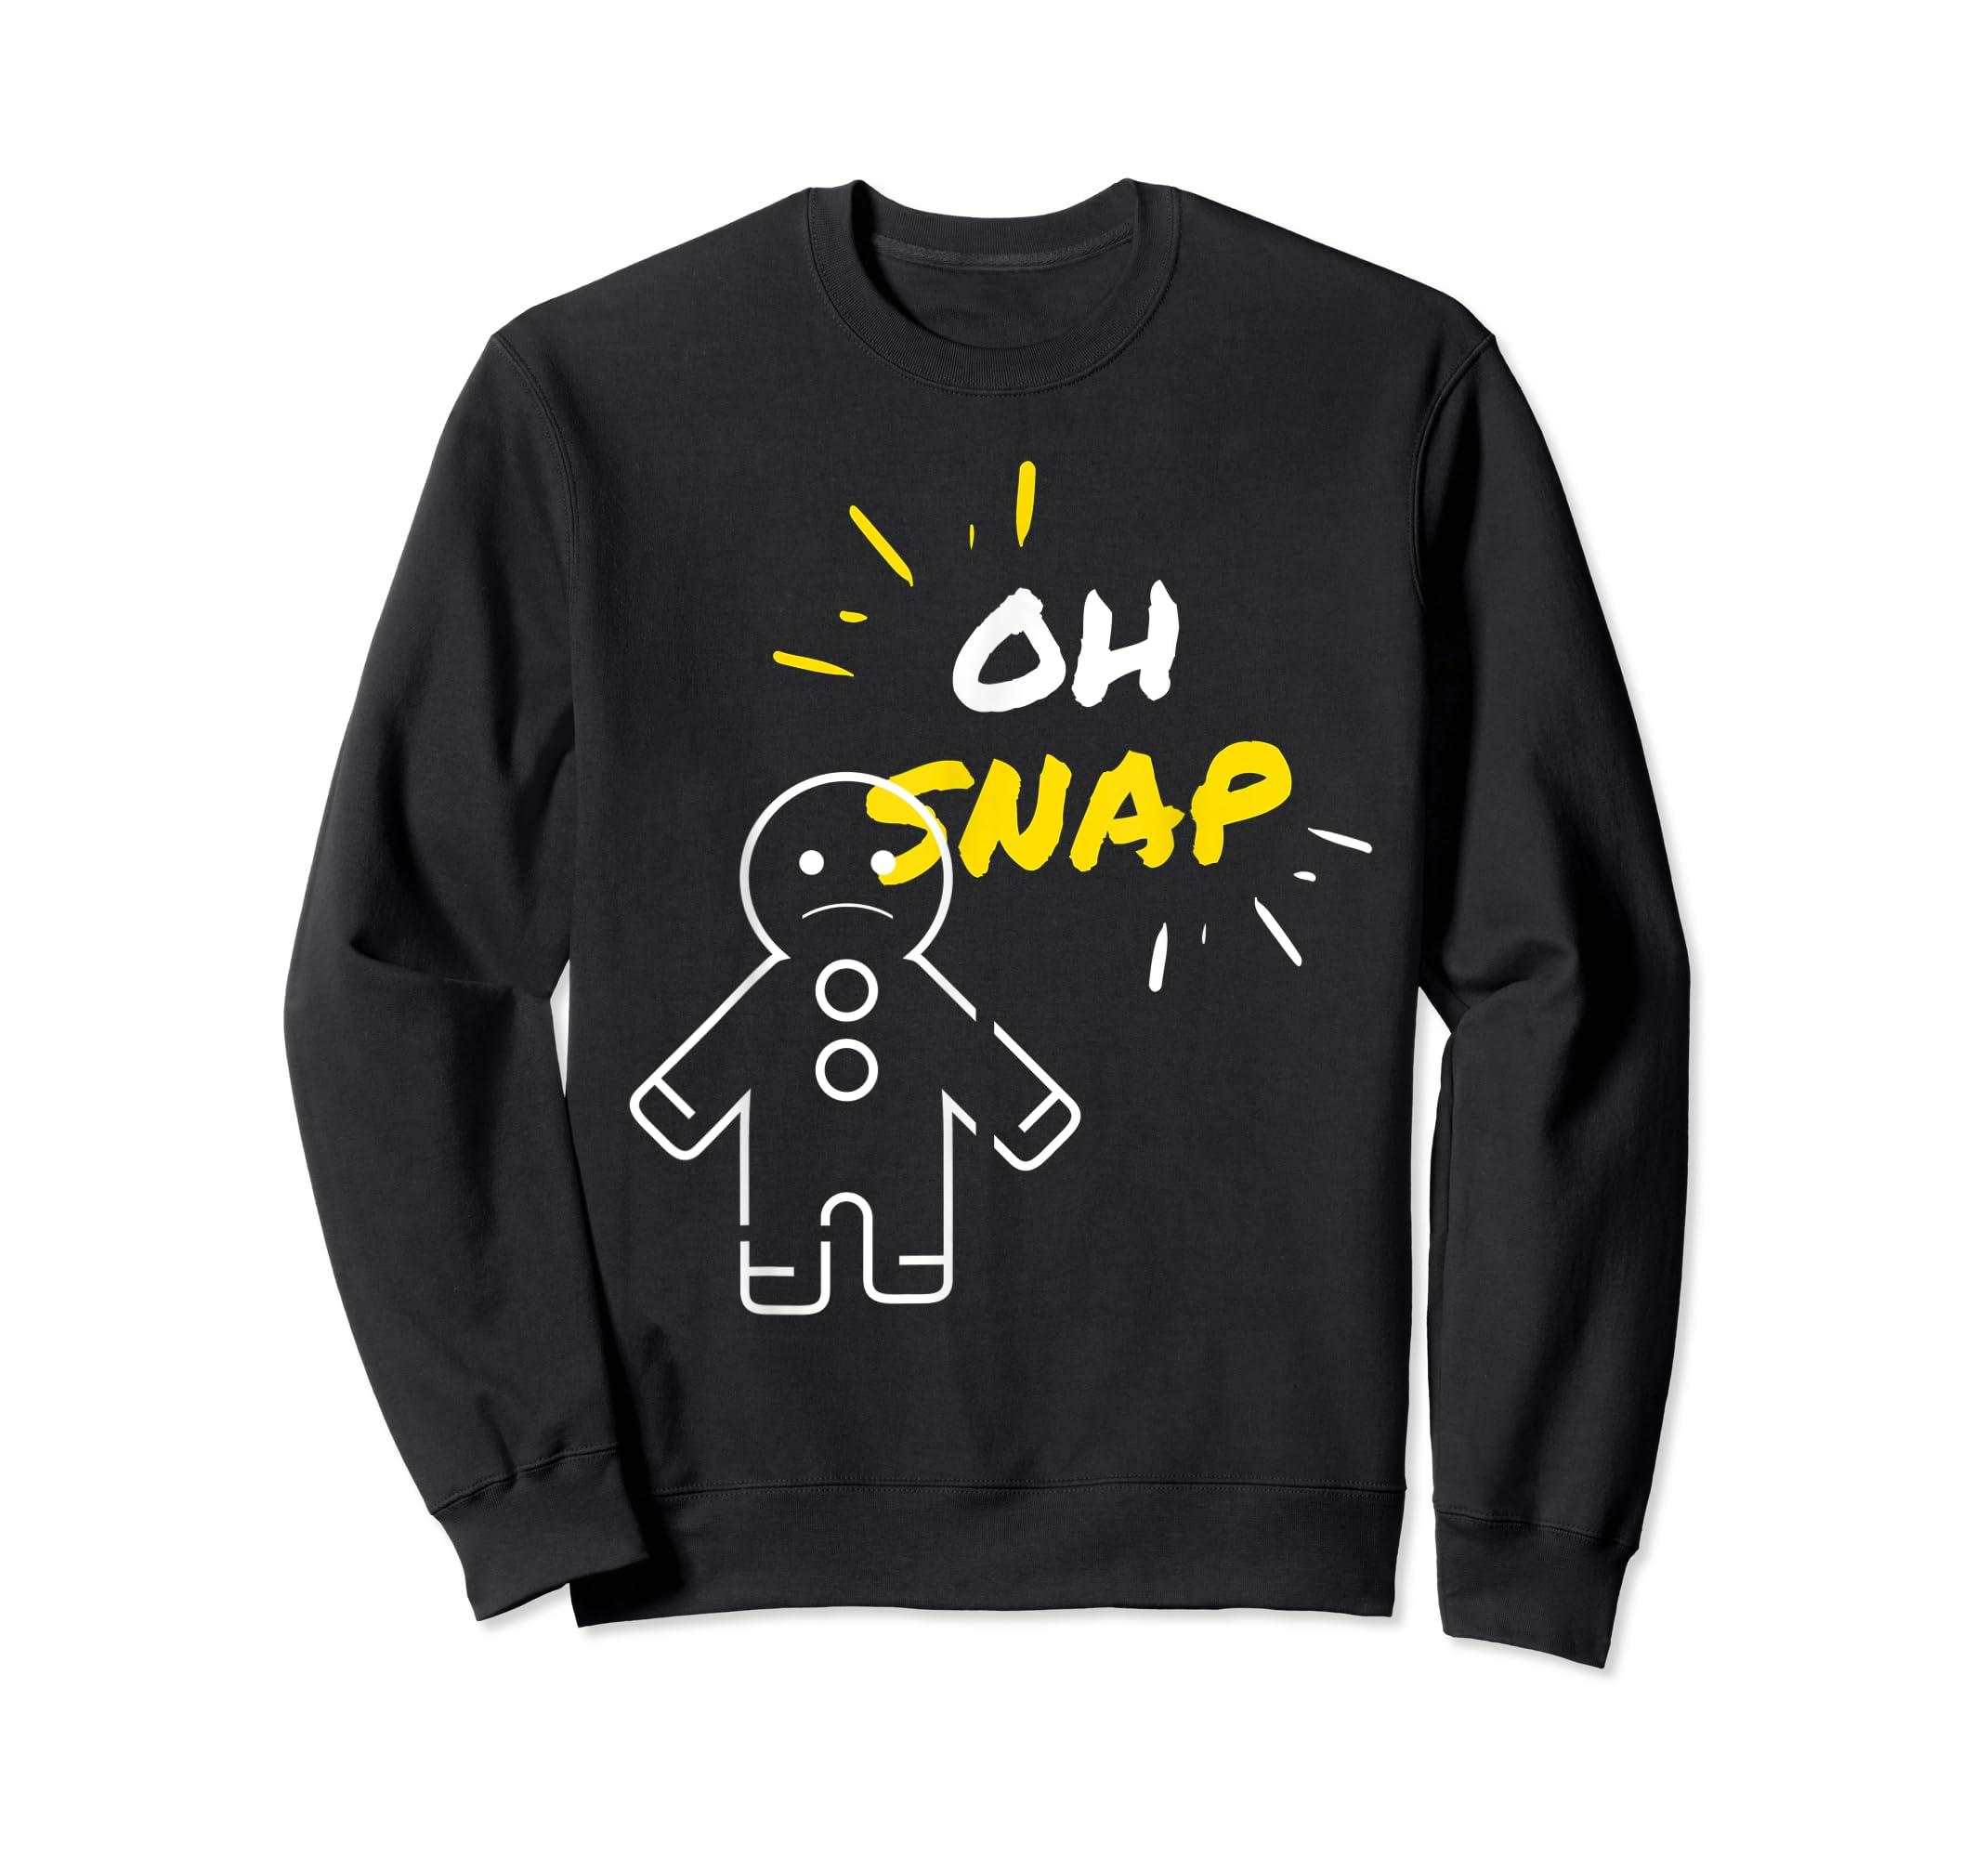 Oh Snap Christmas Gingerbread Man Holiday Cookies Funny T-Shirt-Sweatshirt-Black